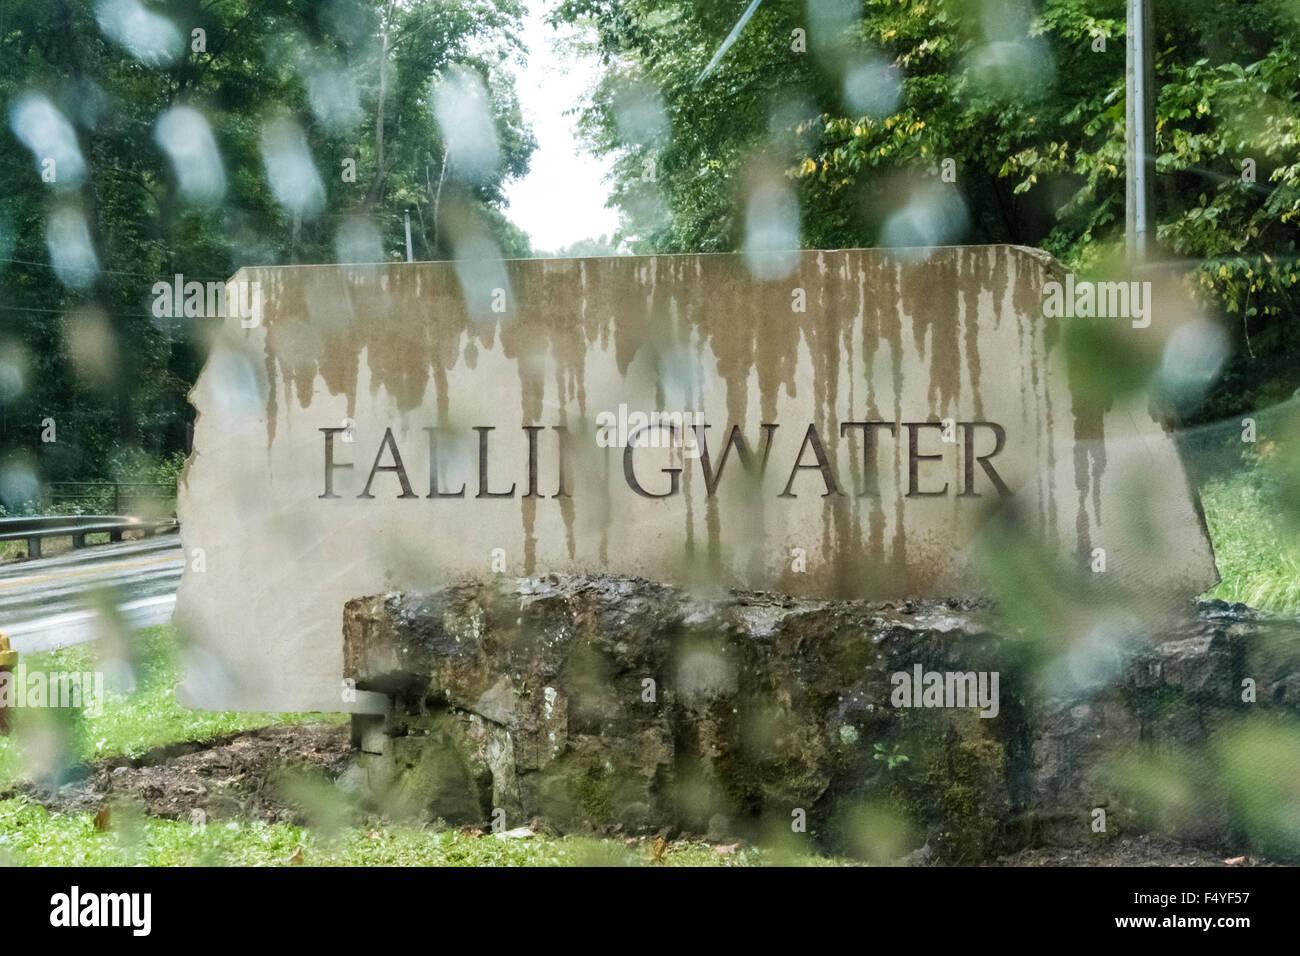 Fallingwater road sign in the rain. - Stock Image